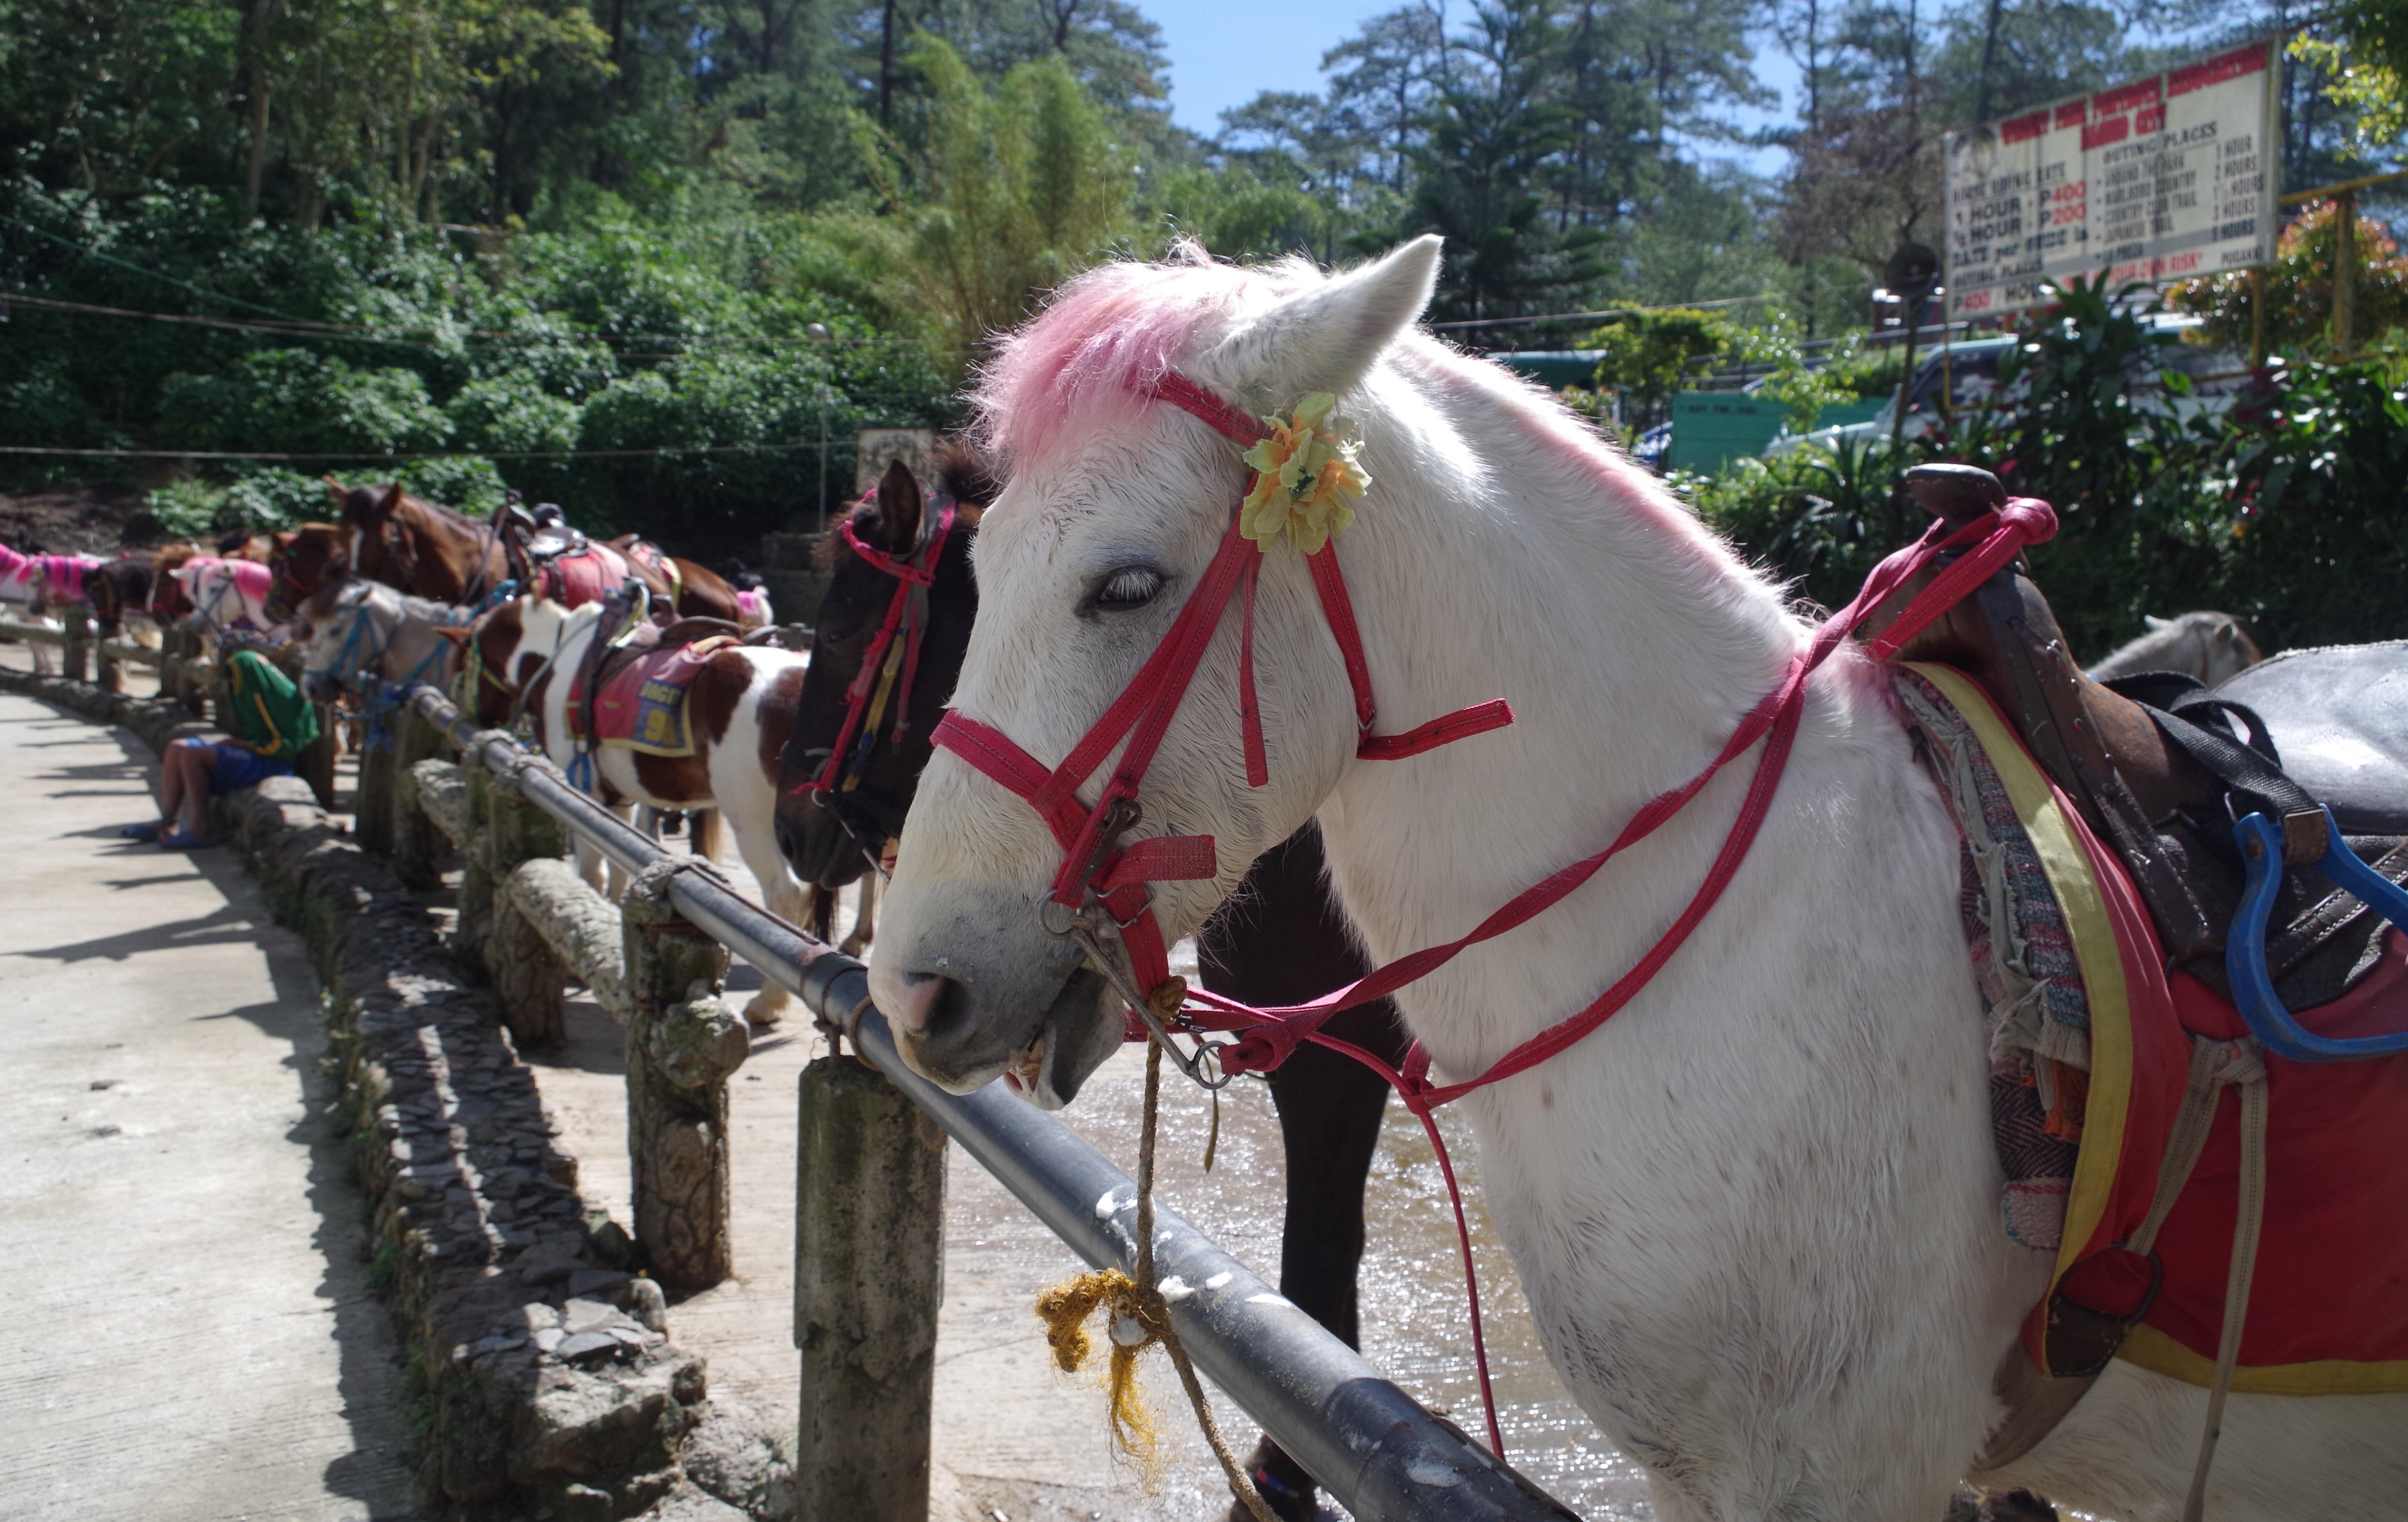 Wright Park Horses ready for hire